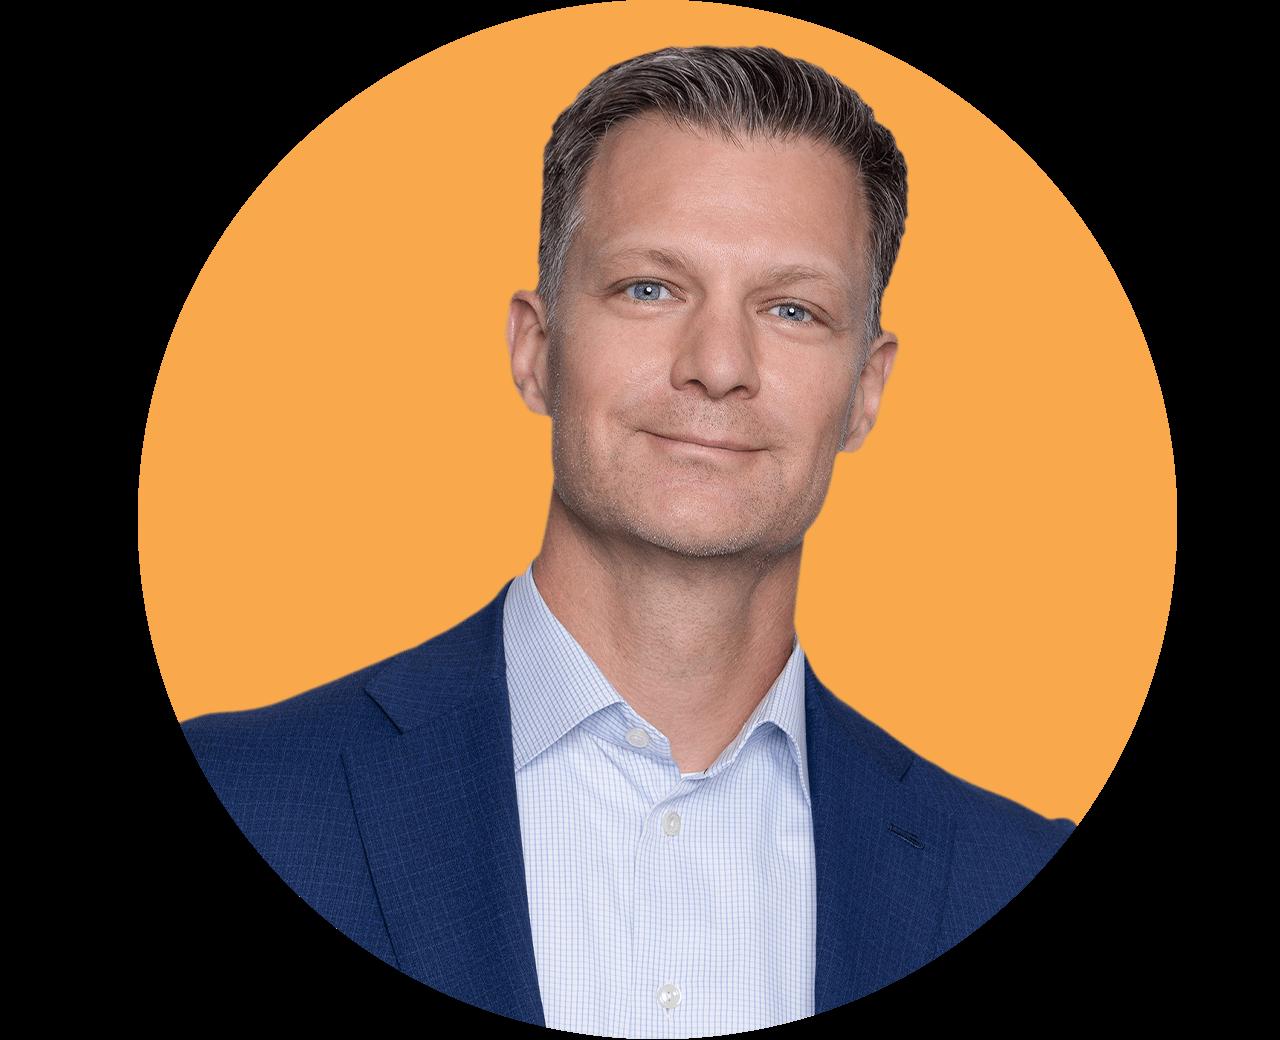 Steve Lucas - Chief Executive Officer